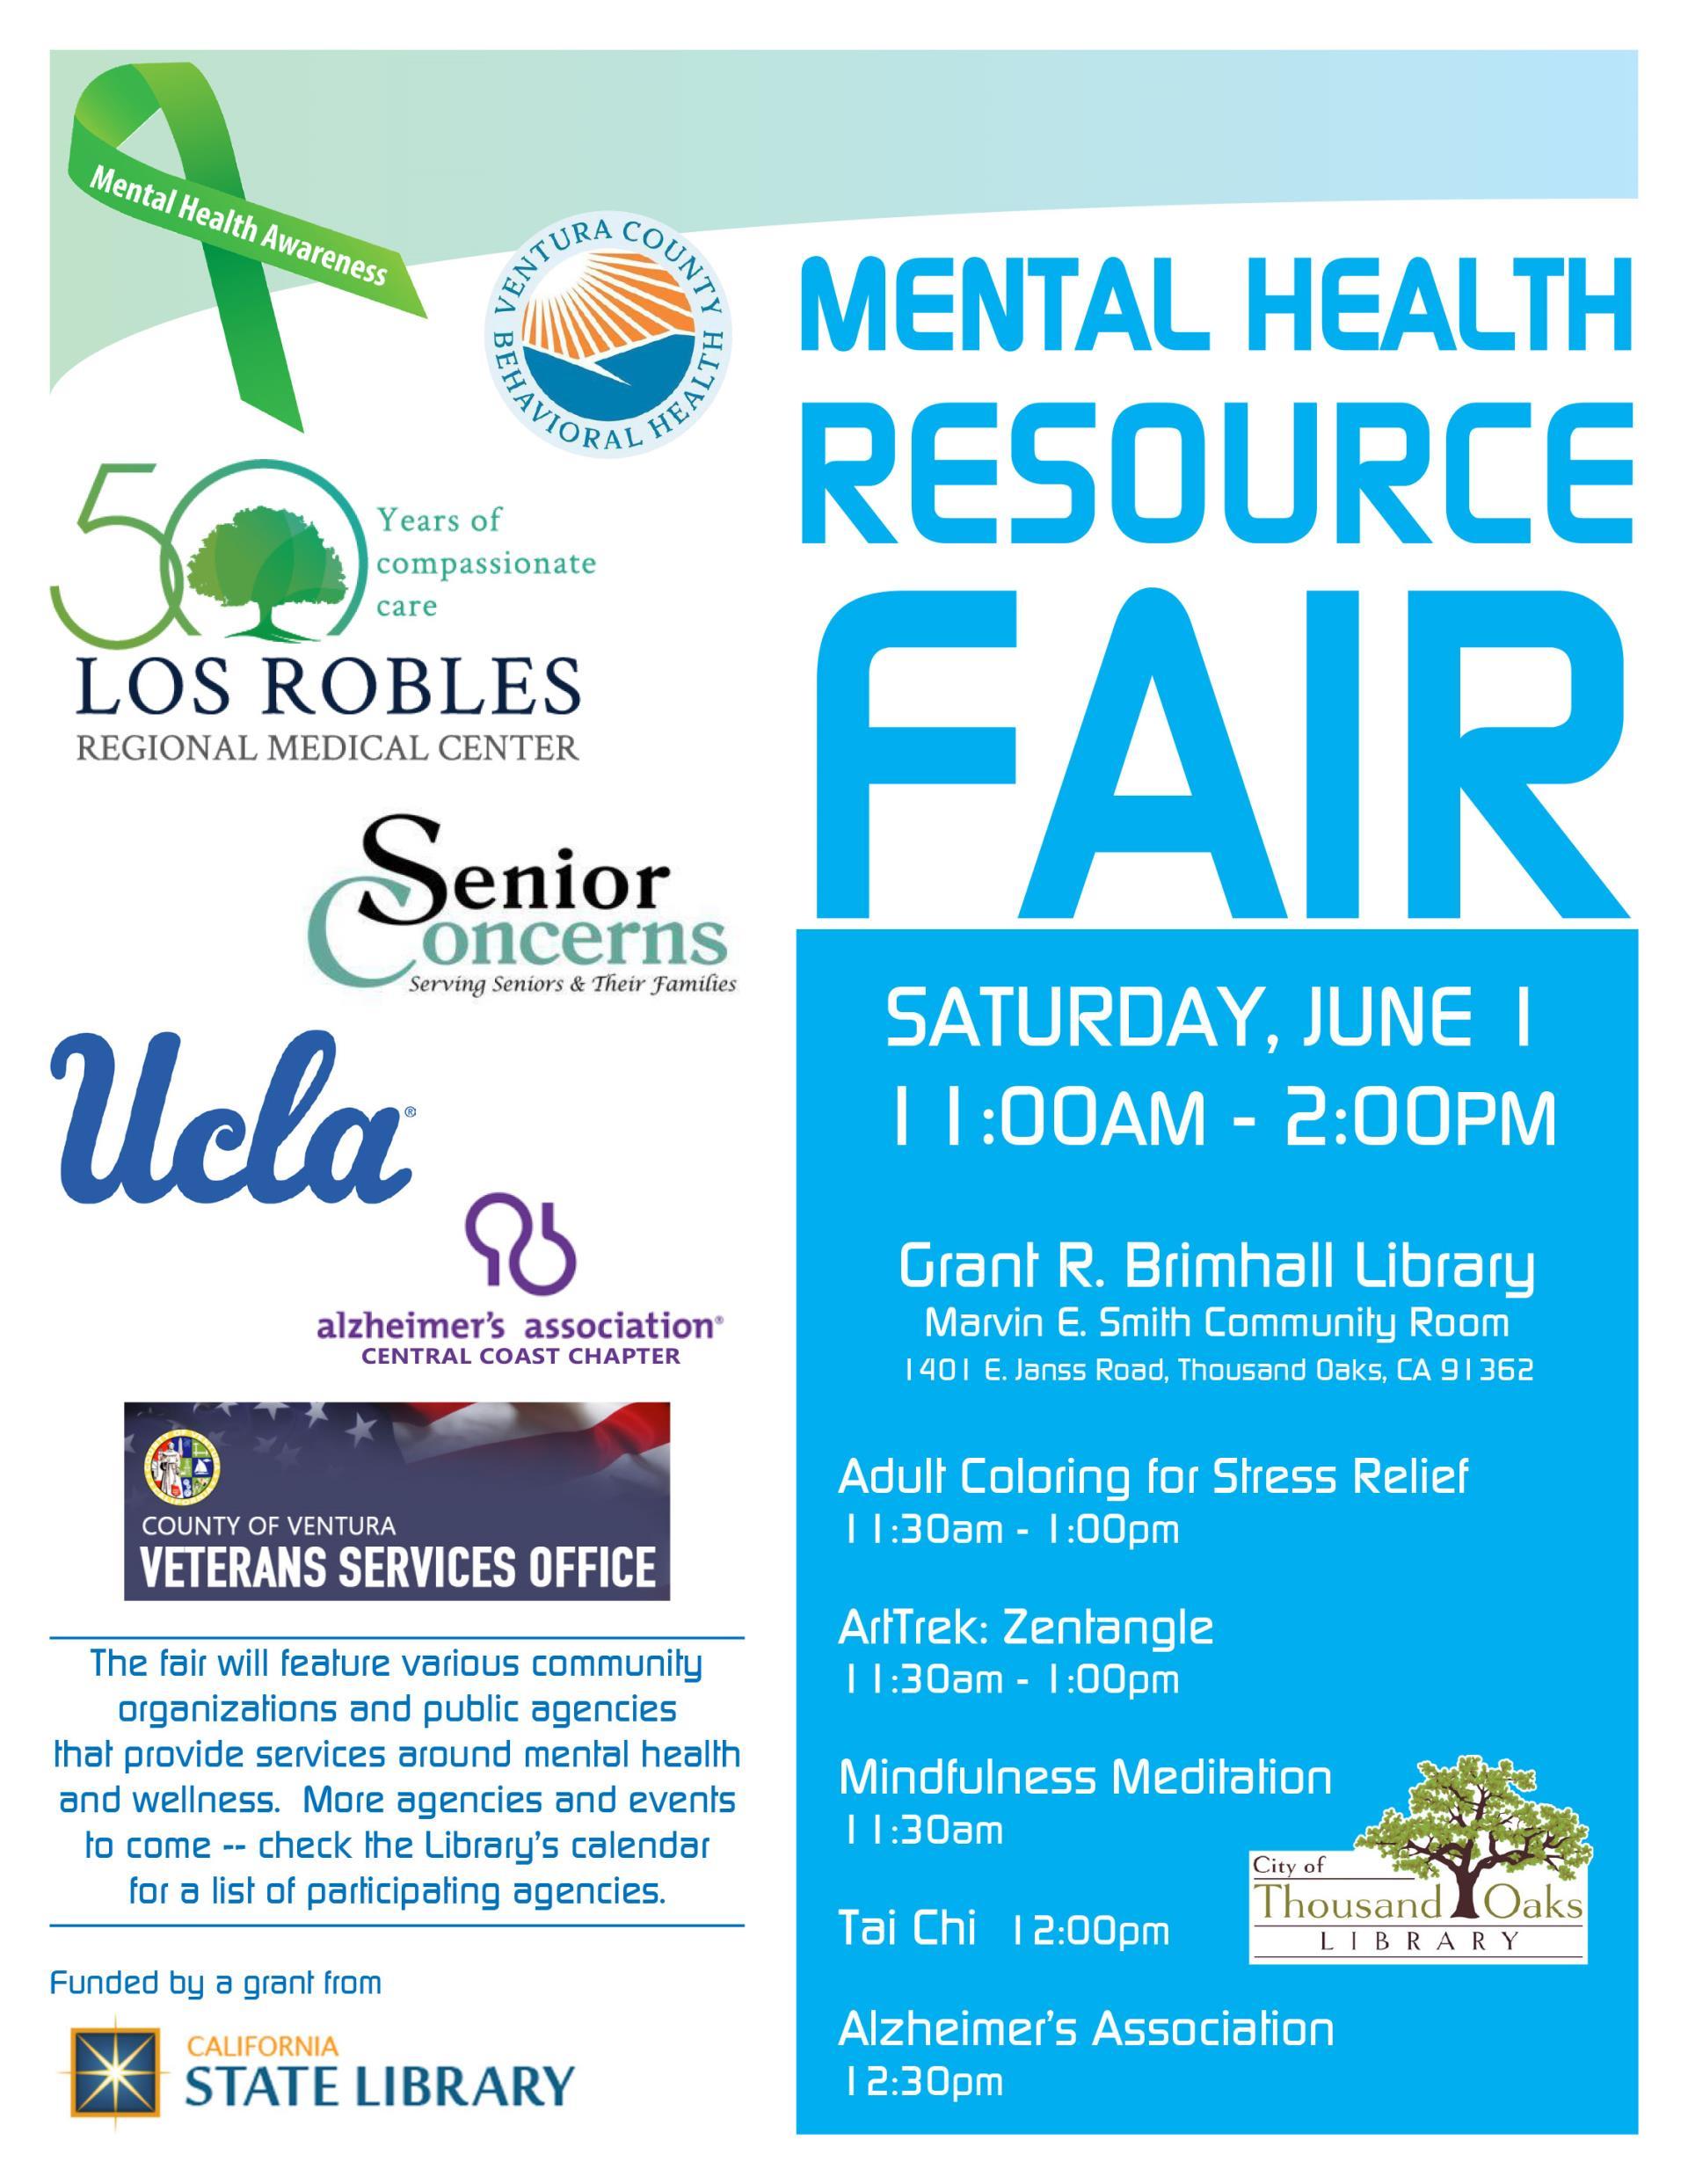 June 1 Mental Health Resource Fair Thousand Oaks